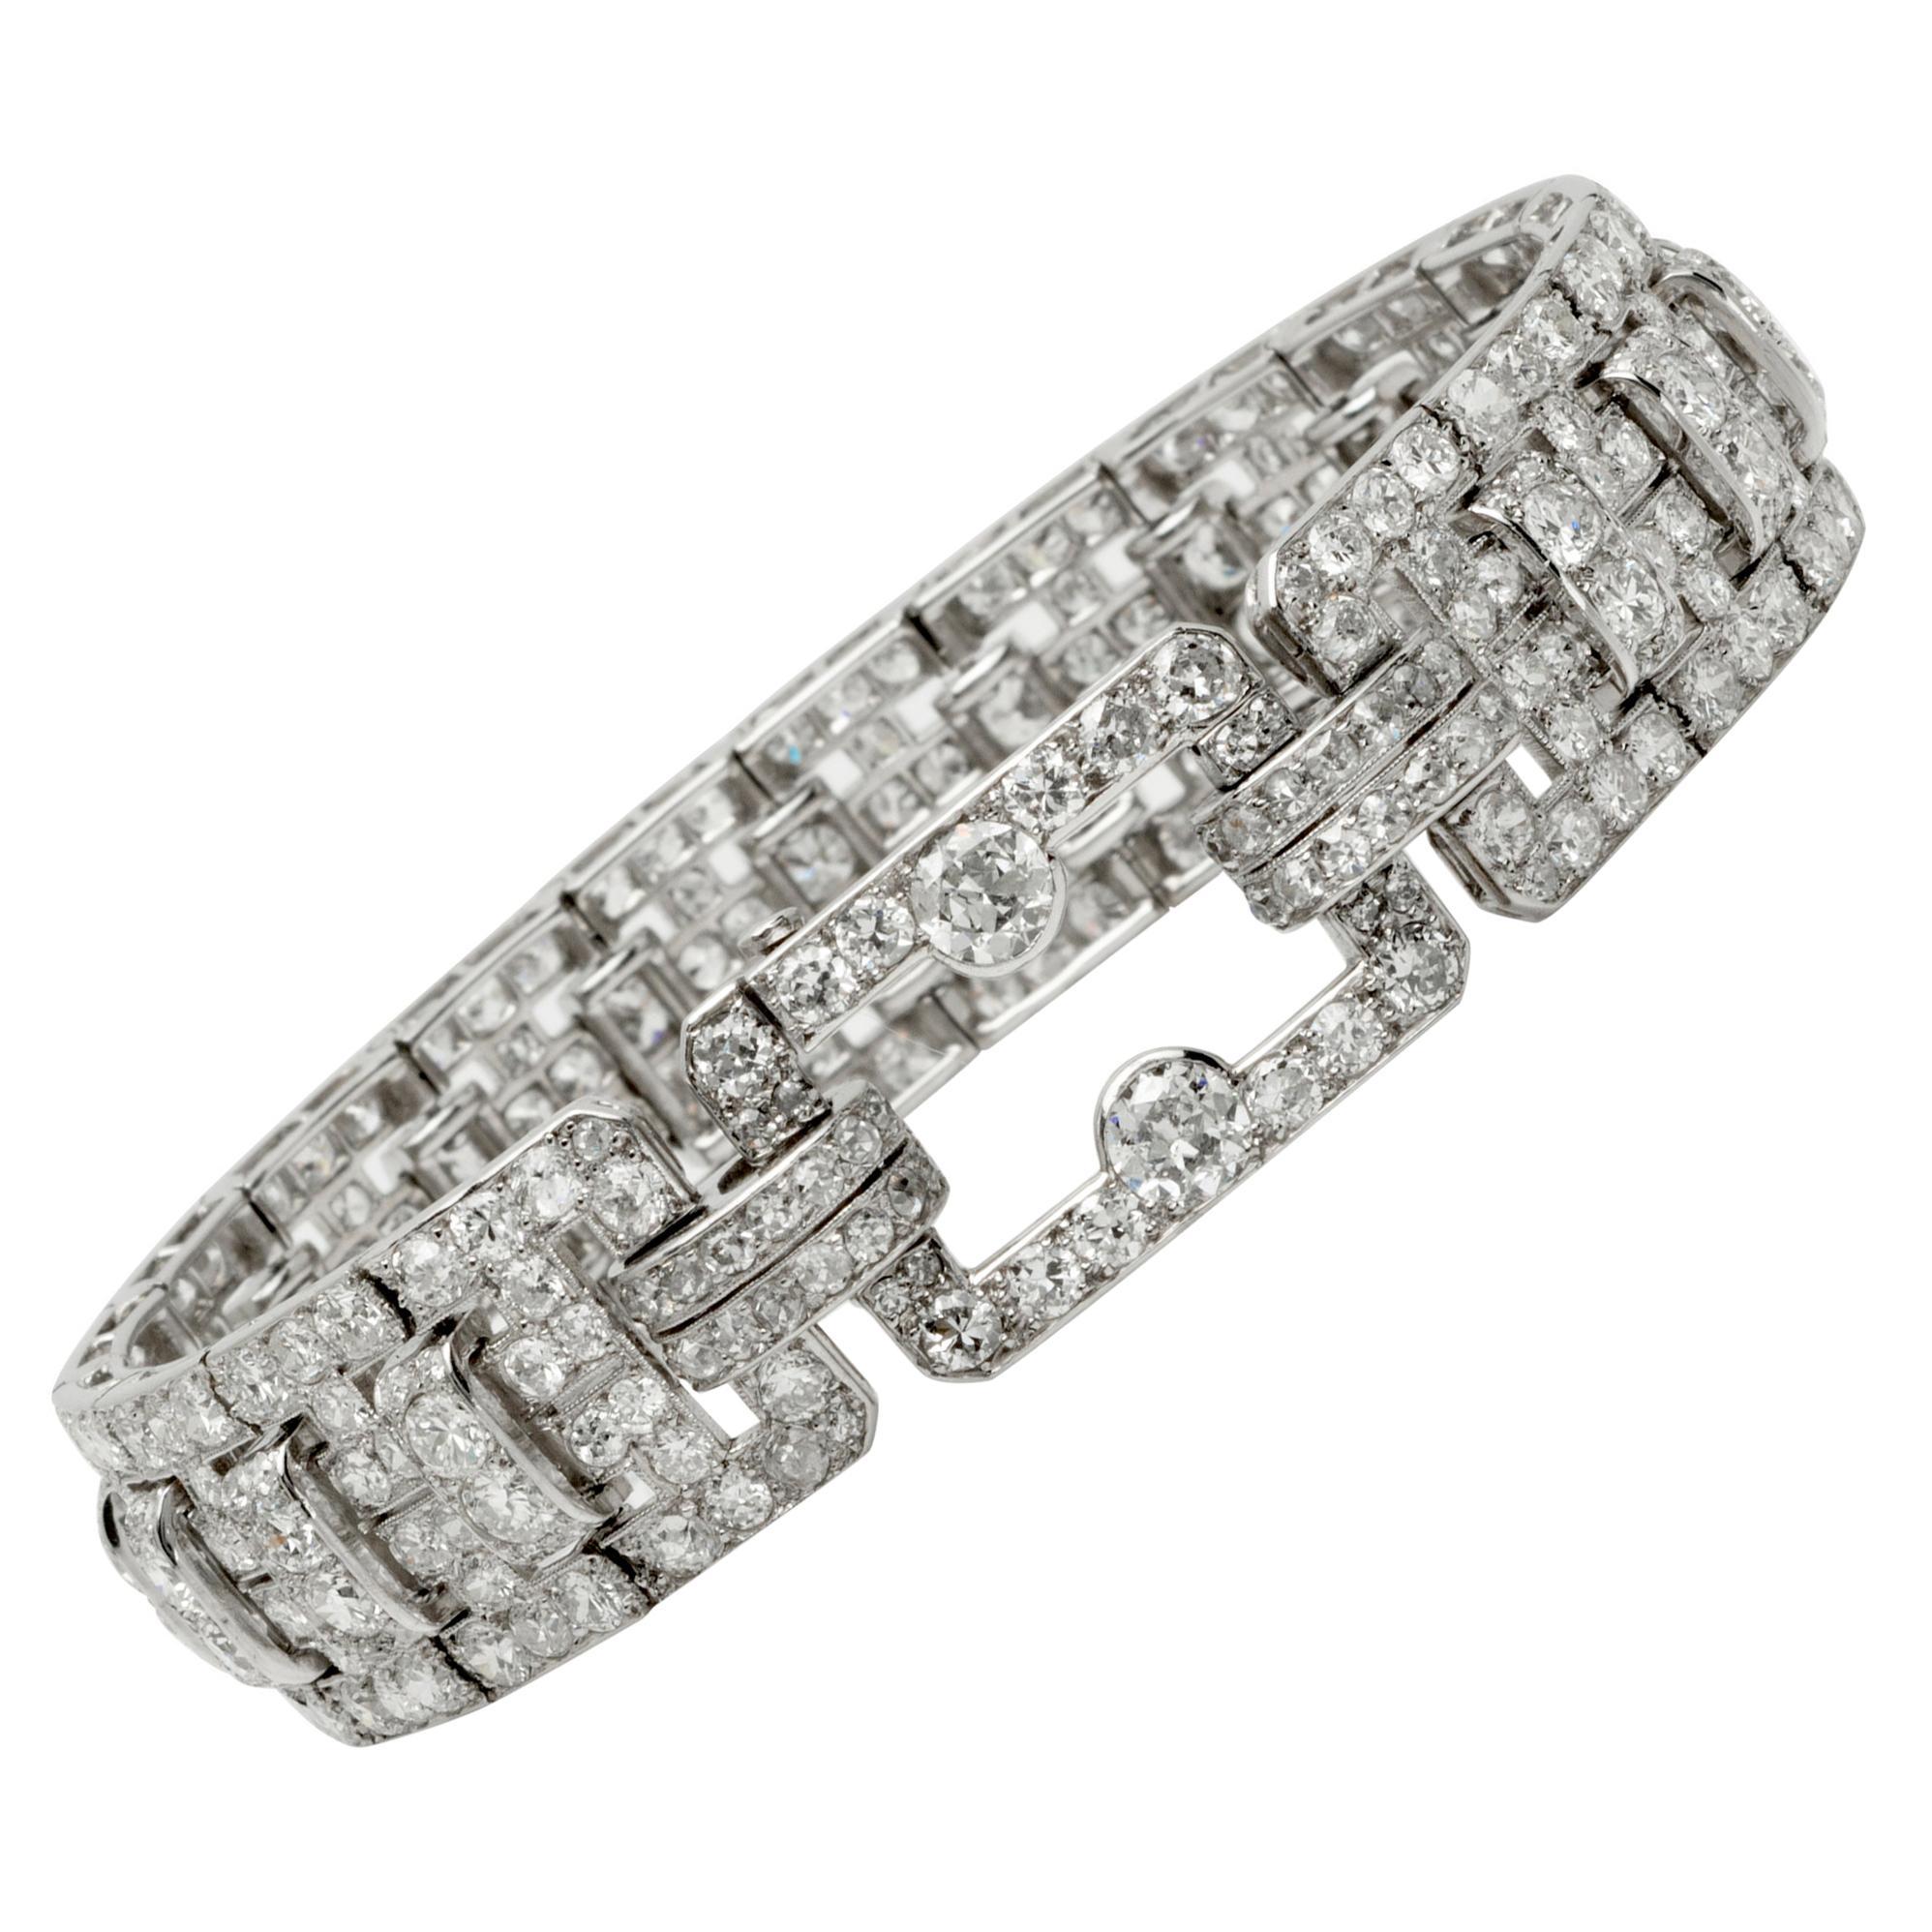 Cartier Platinum and Diamond Art Deco Bracelet